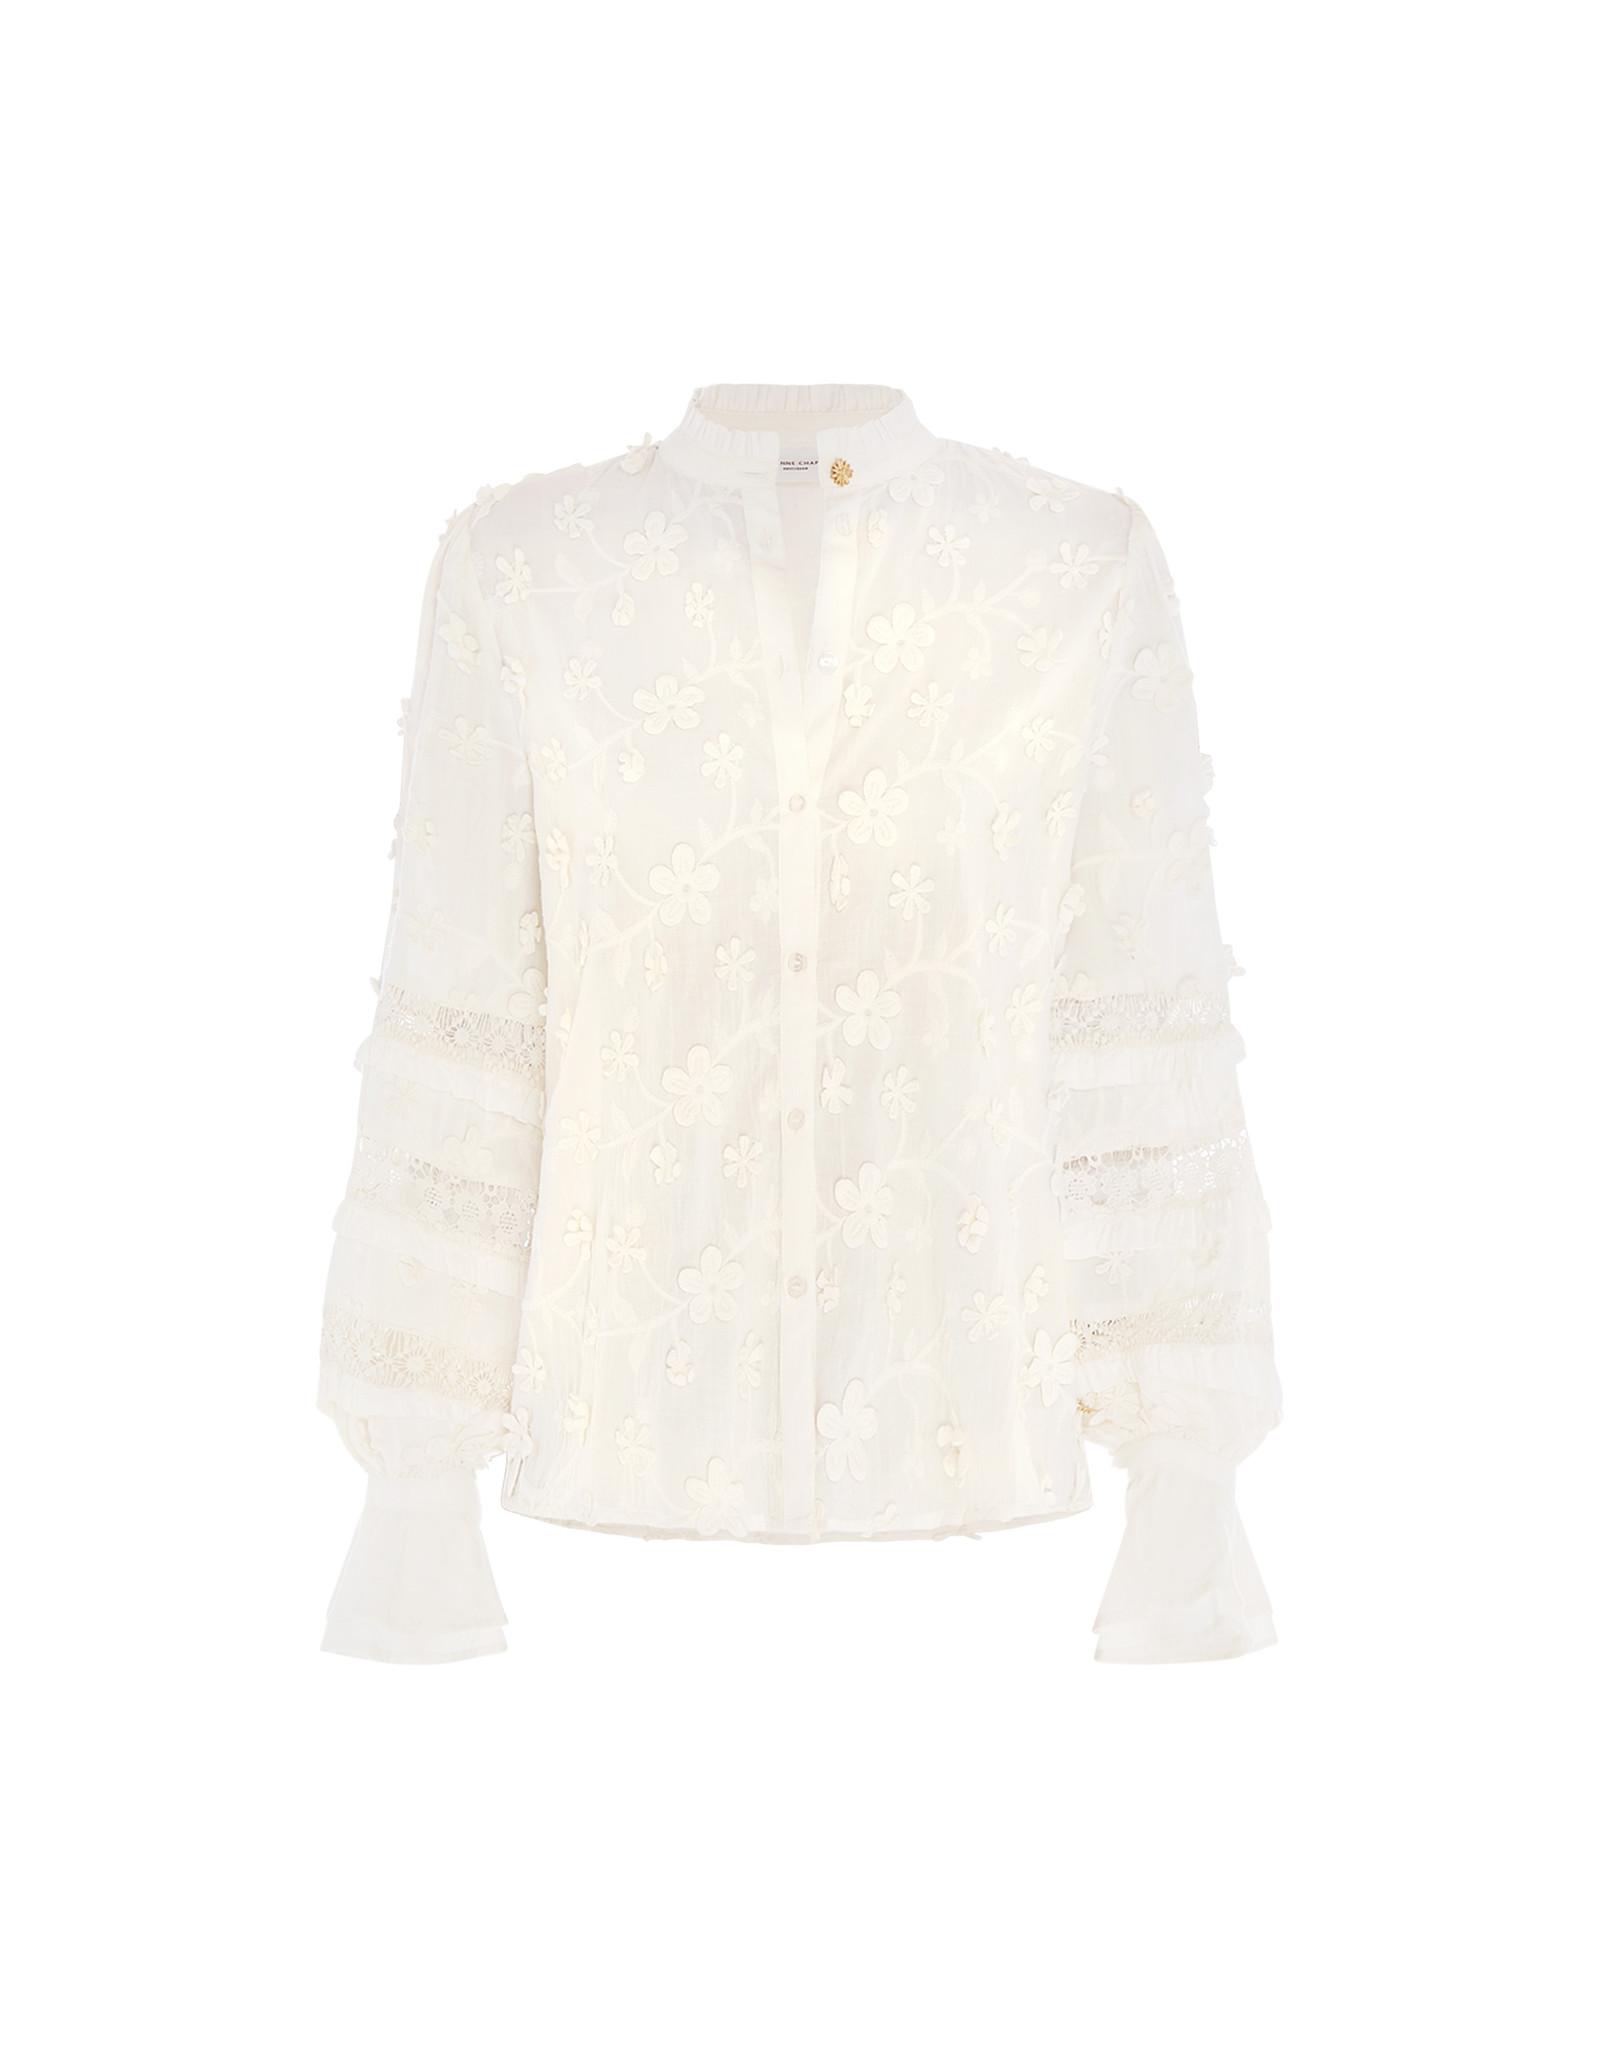 Fabienne Chapot Leo Blouse Cream White